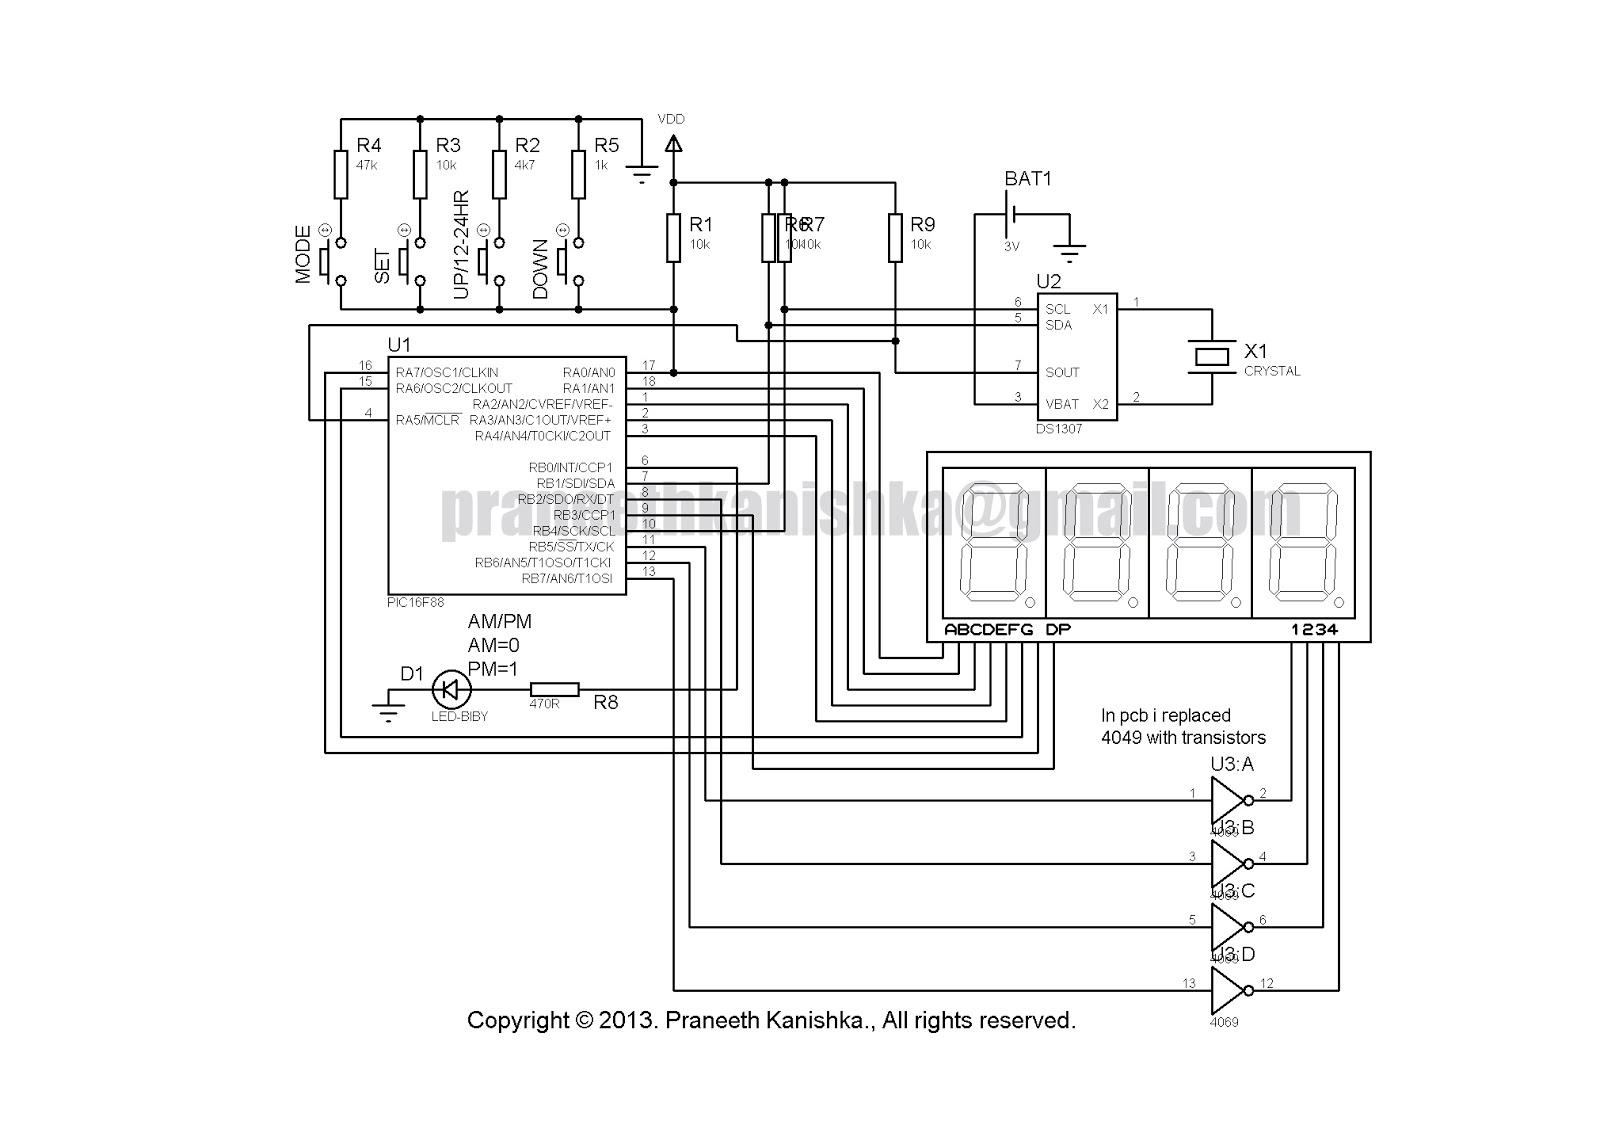 ds1307 real time clock circuit circuit diagram [ 1600 x 1125 Pixel ]